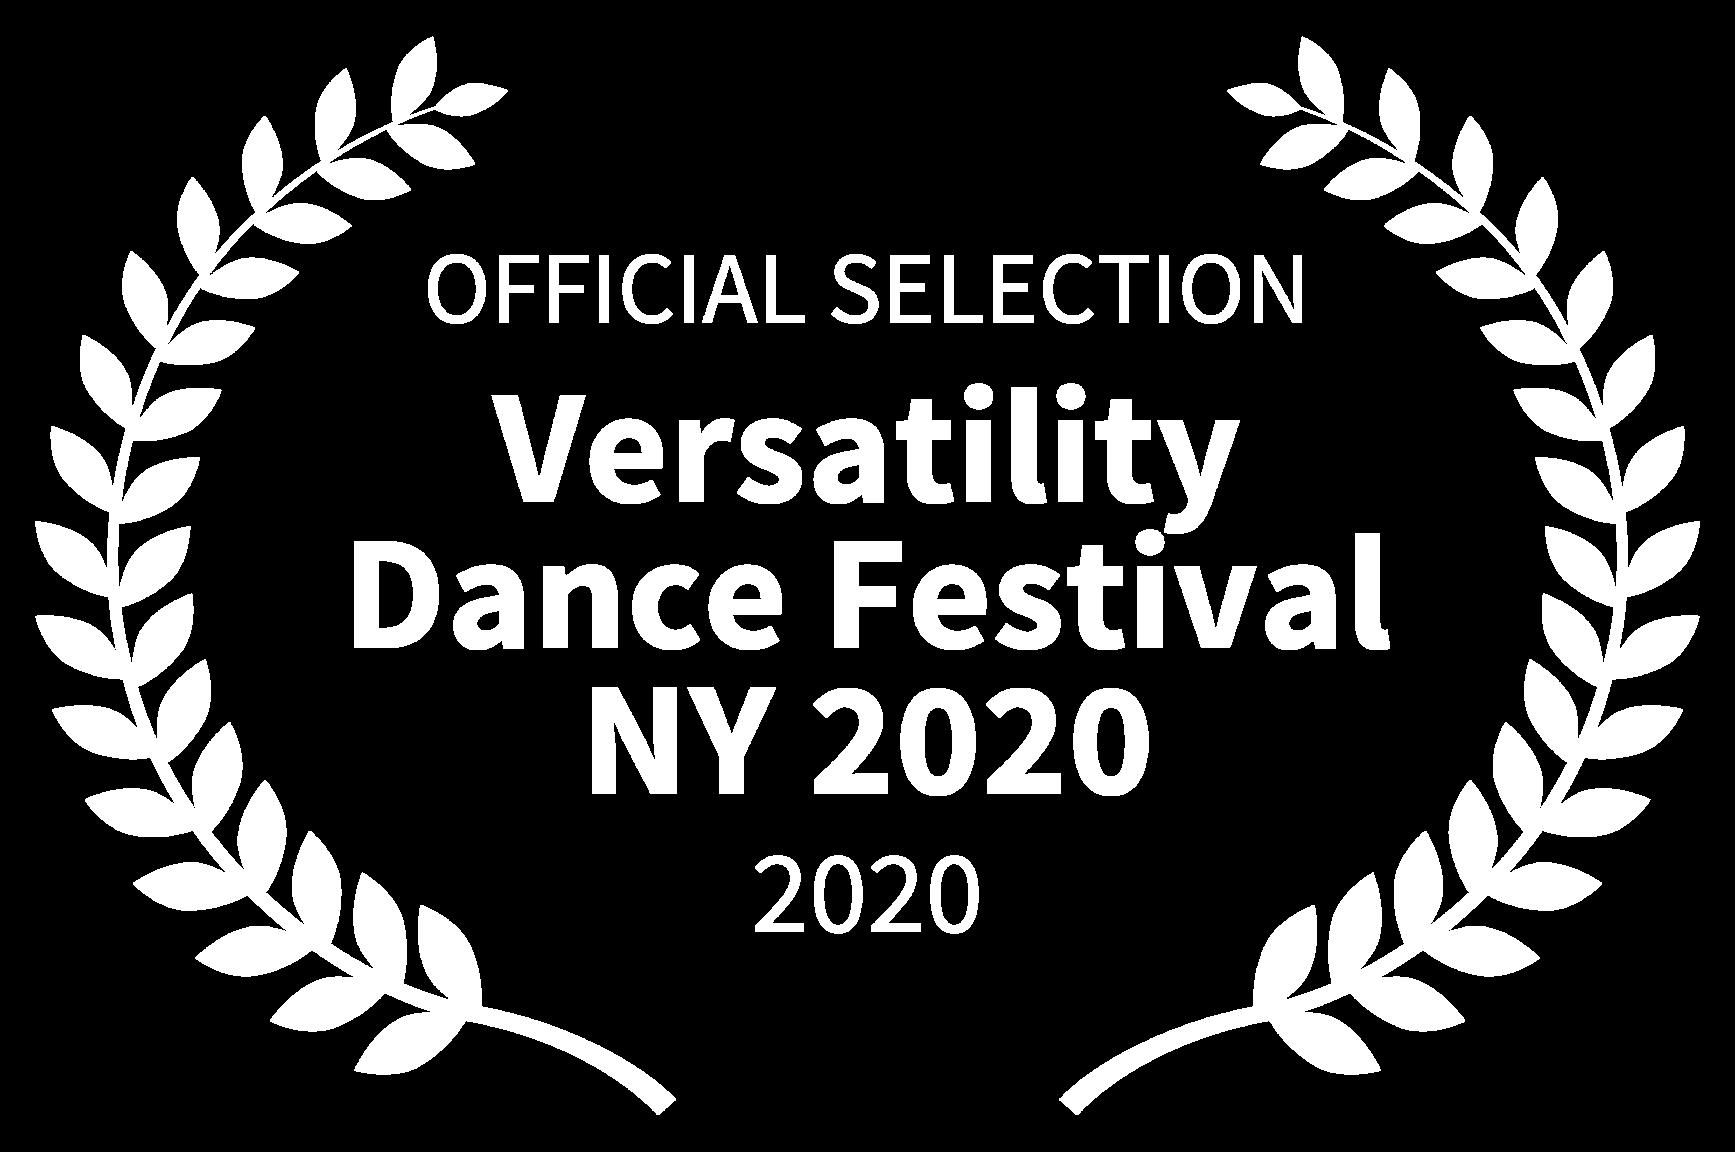 OFFICIAL SELECTION - Versatility Dance F